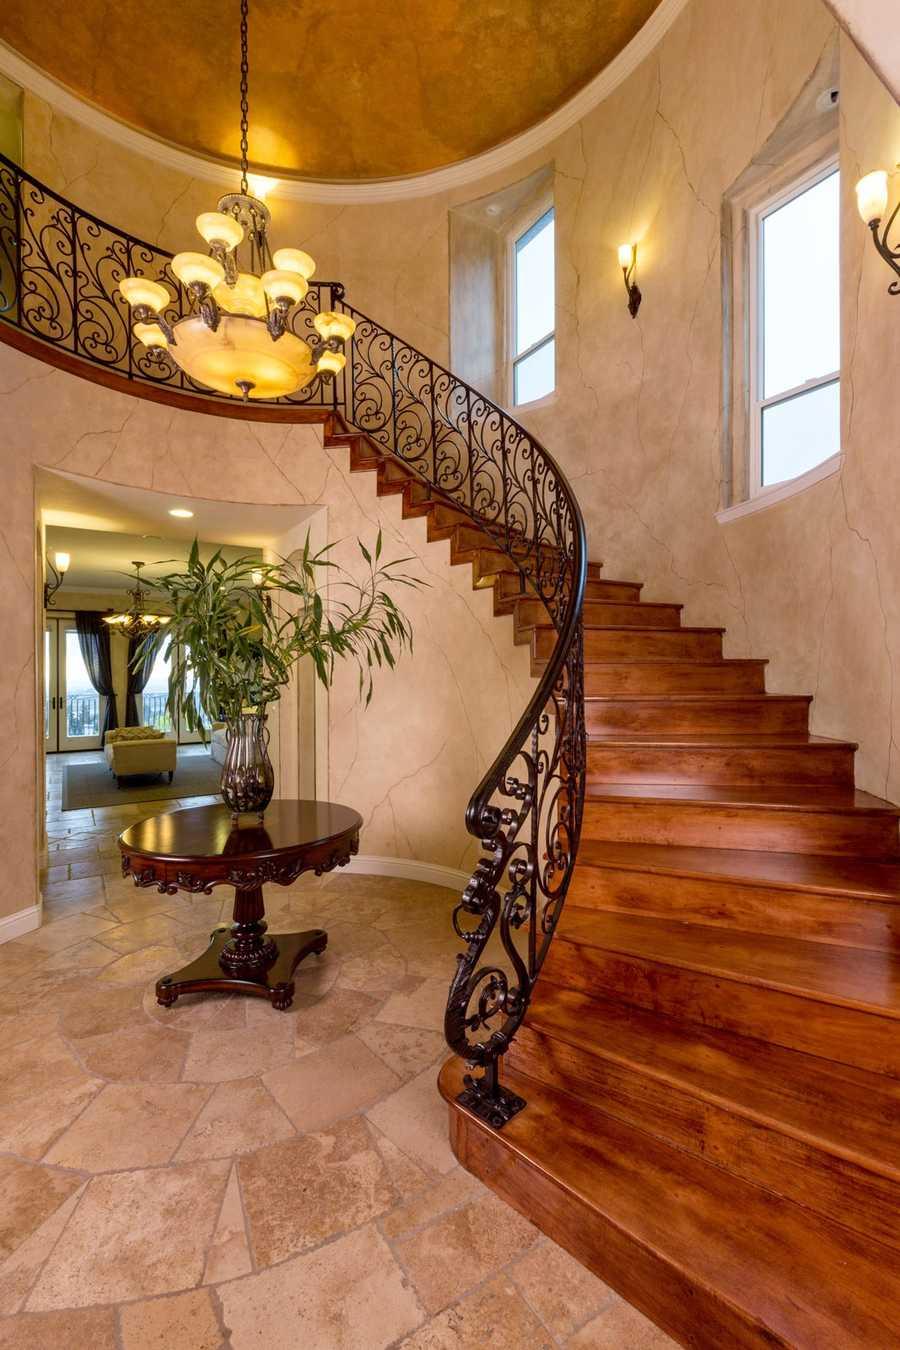 The 5,600-square-foot estate is located in a prestigious area of Ridgeview.